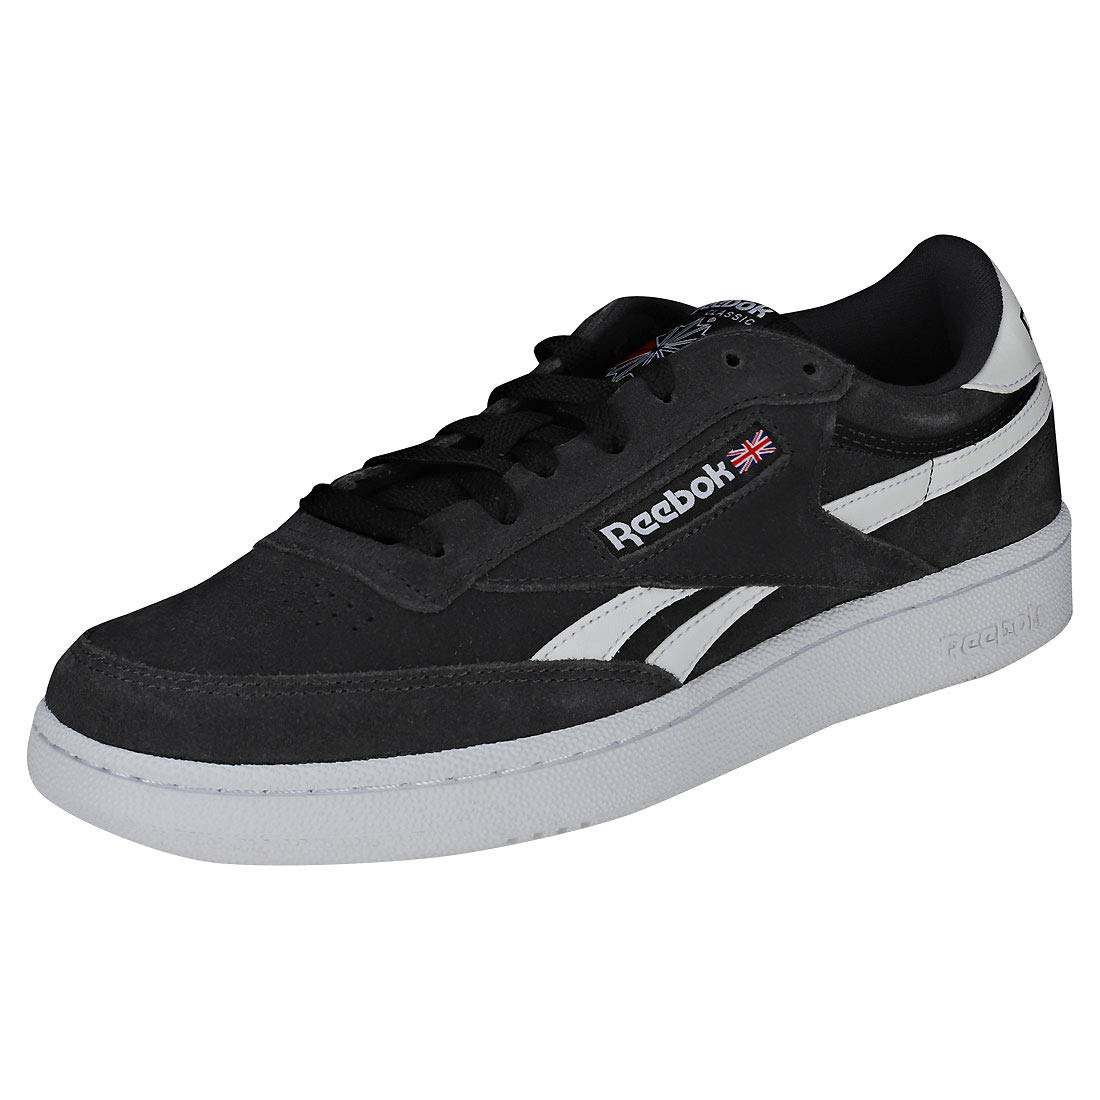 daf135393b7 Reebok Men's Revenge Plus Mu Fitness Shoes Grey: Amazon.co.uk: Shoes & Bags